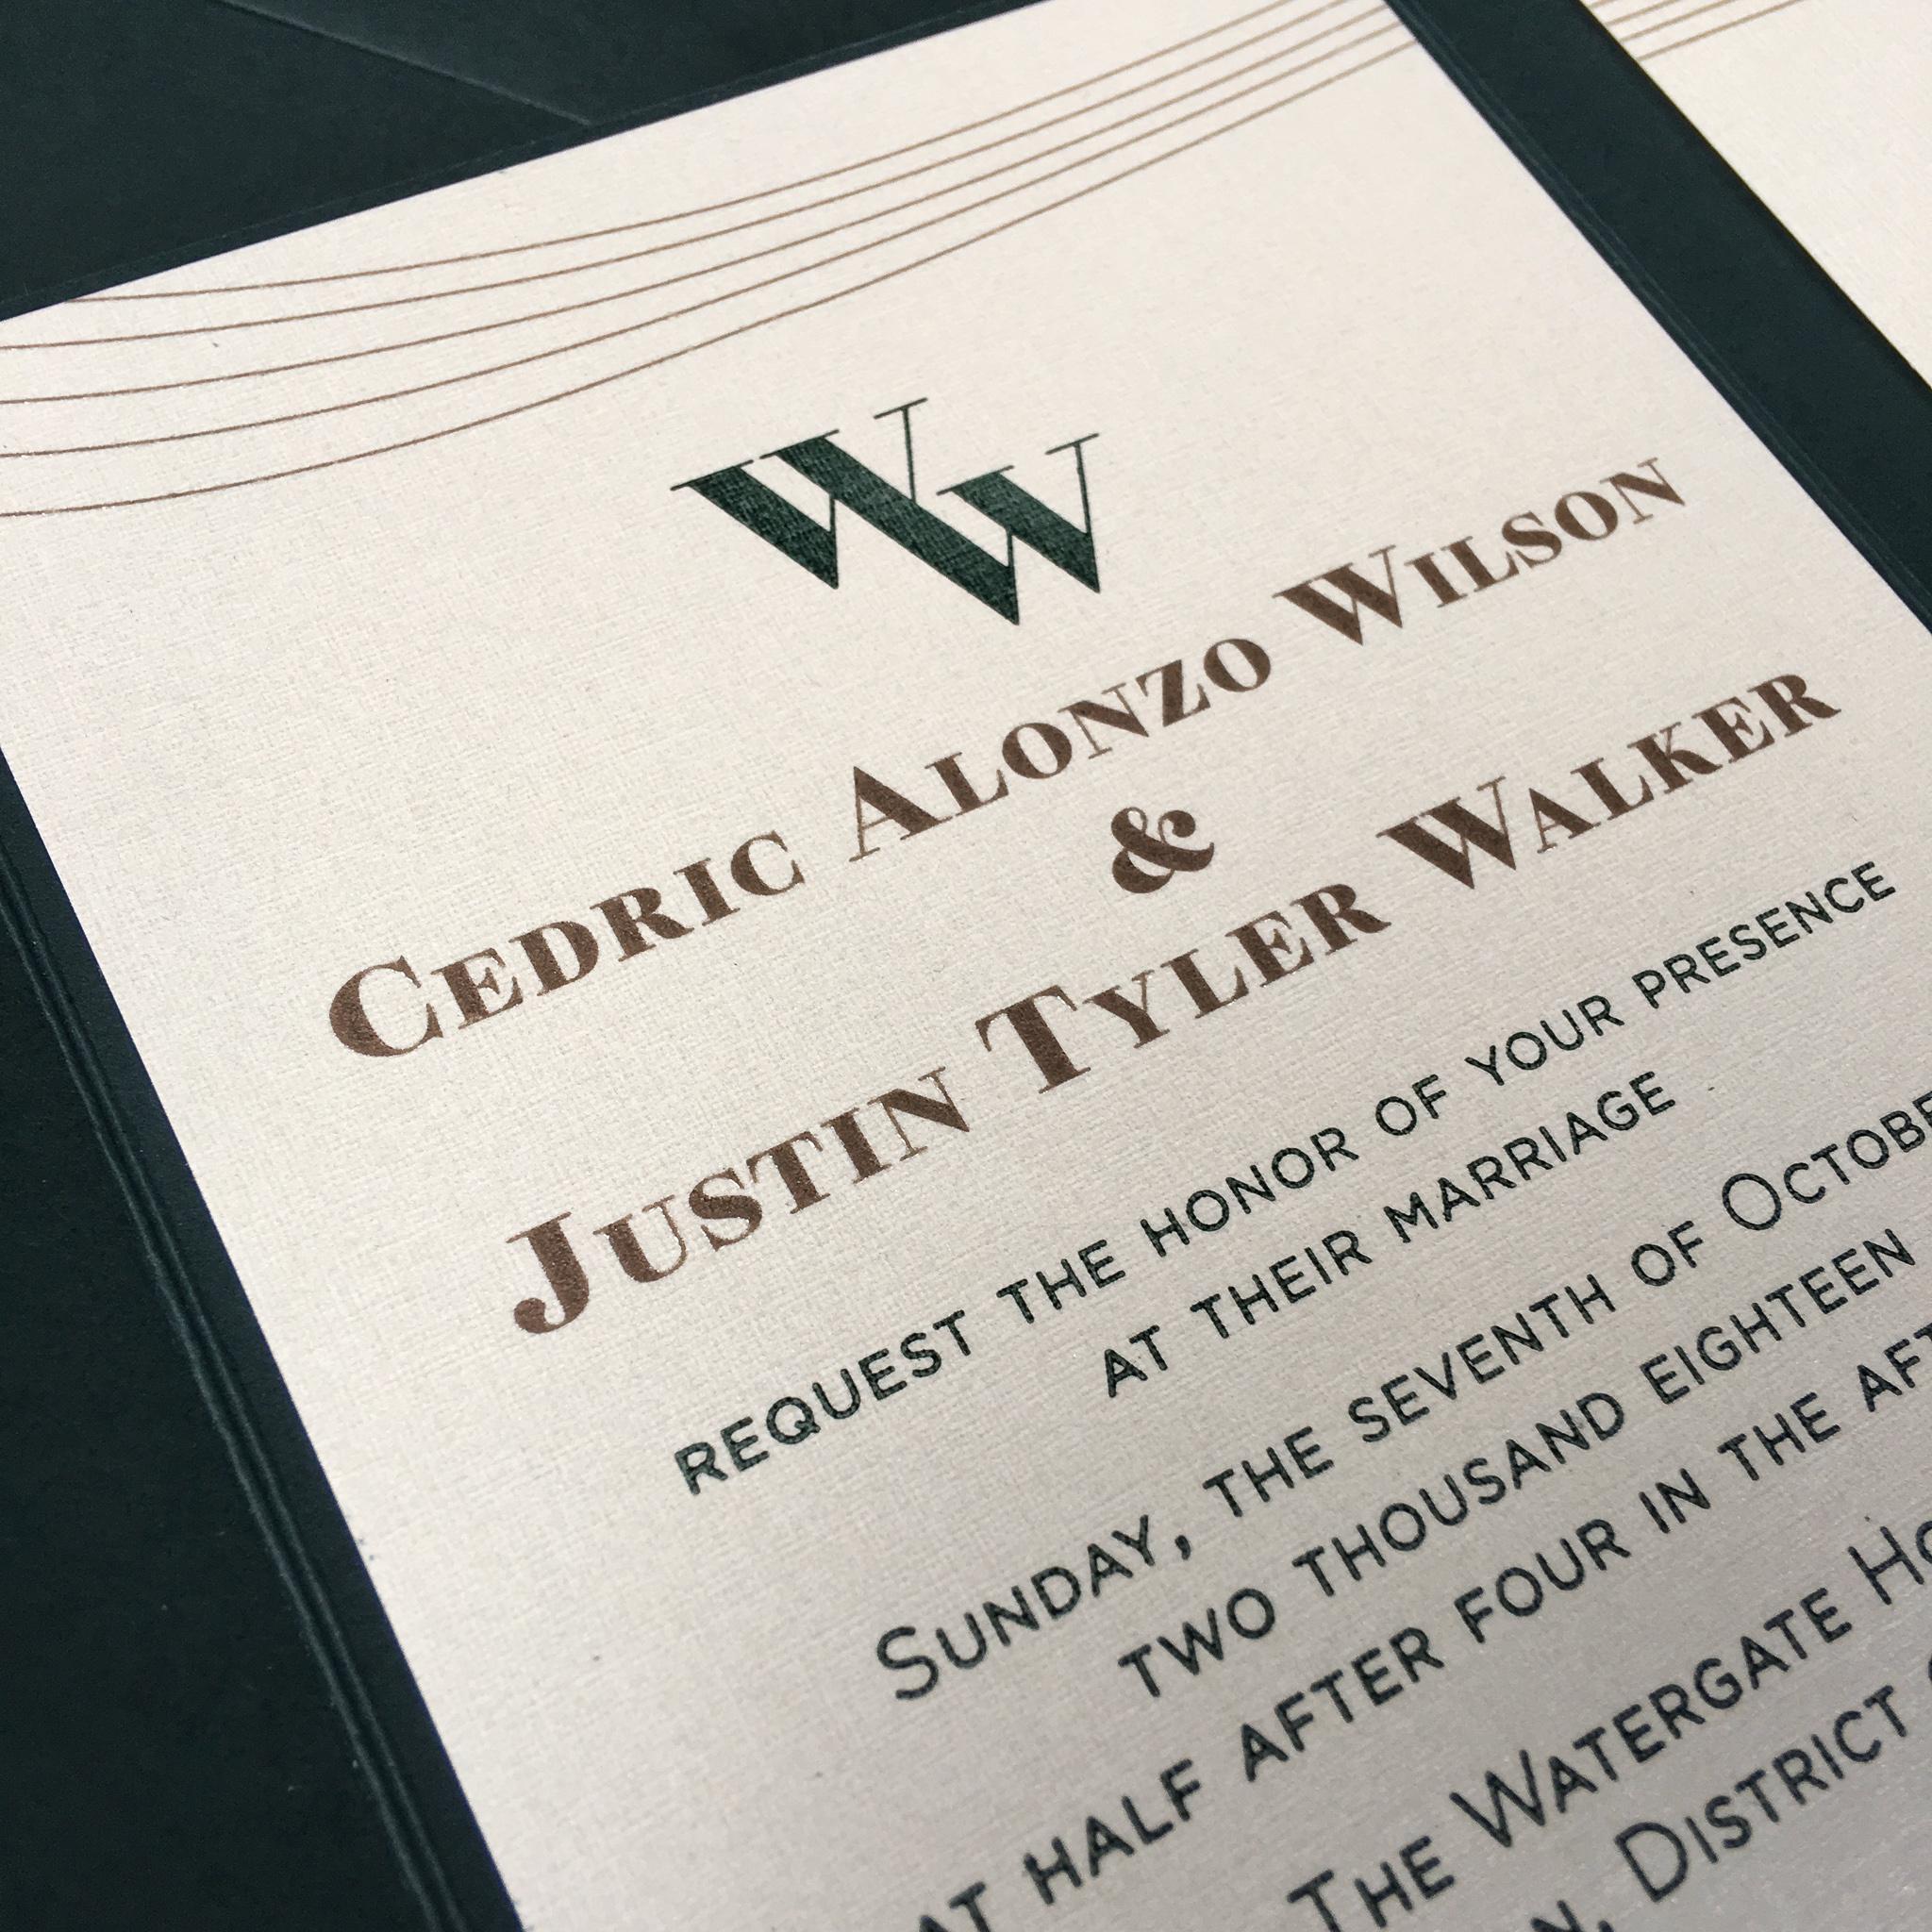 TypeA-Cedric-and-Tyler-DC-Custom-Wedding-Invitation-Calligraphy-Copper-IMG_9271.jpg